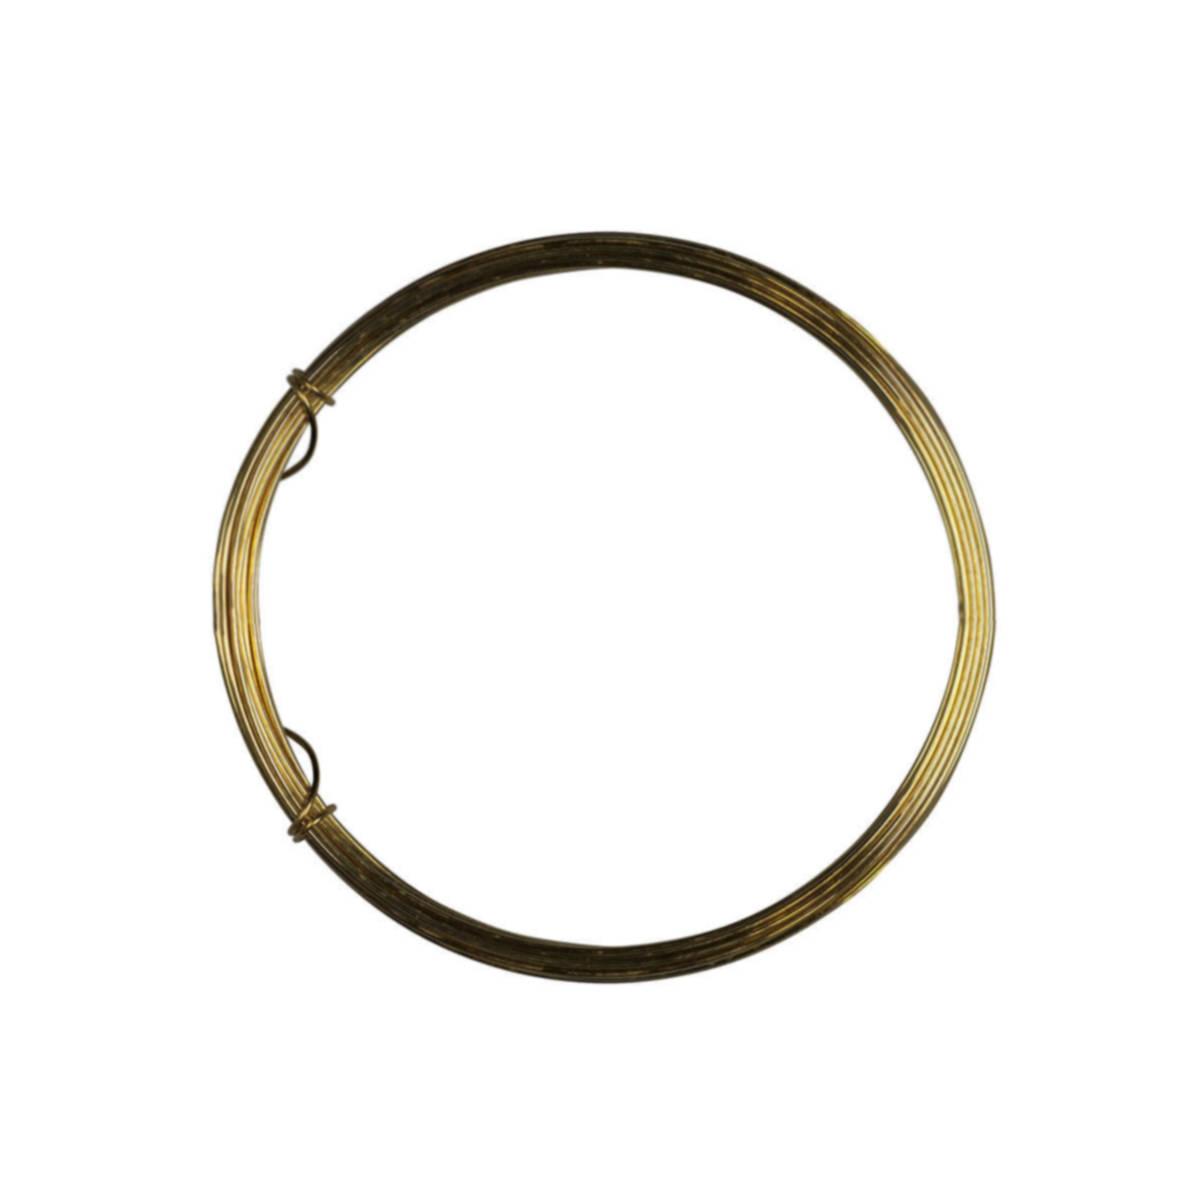 Ben-Mor Cables 93043